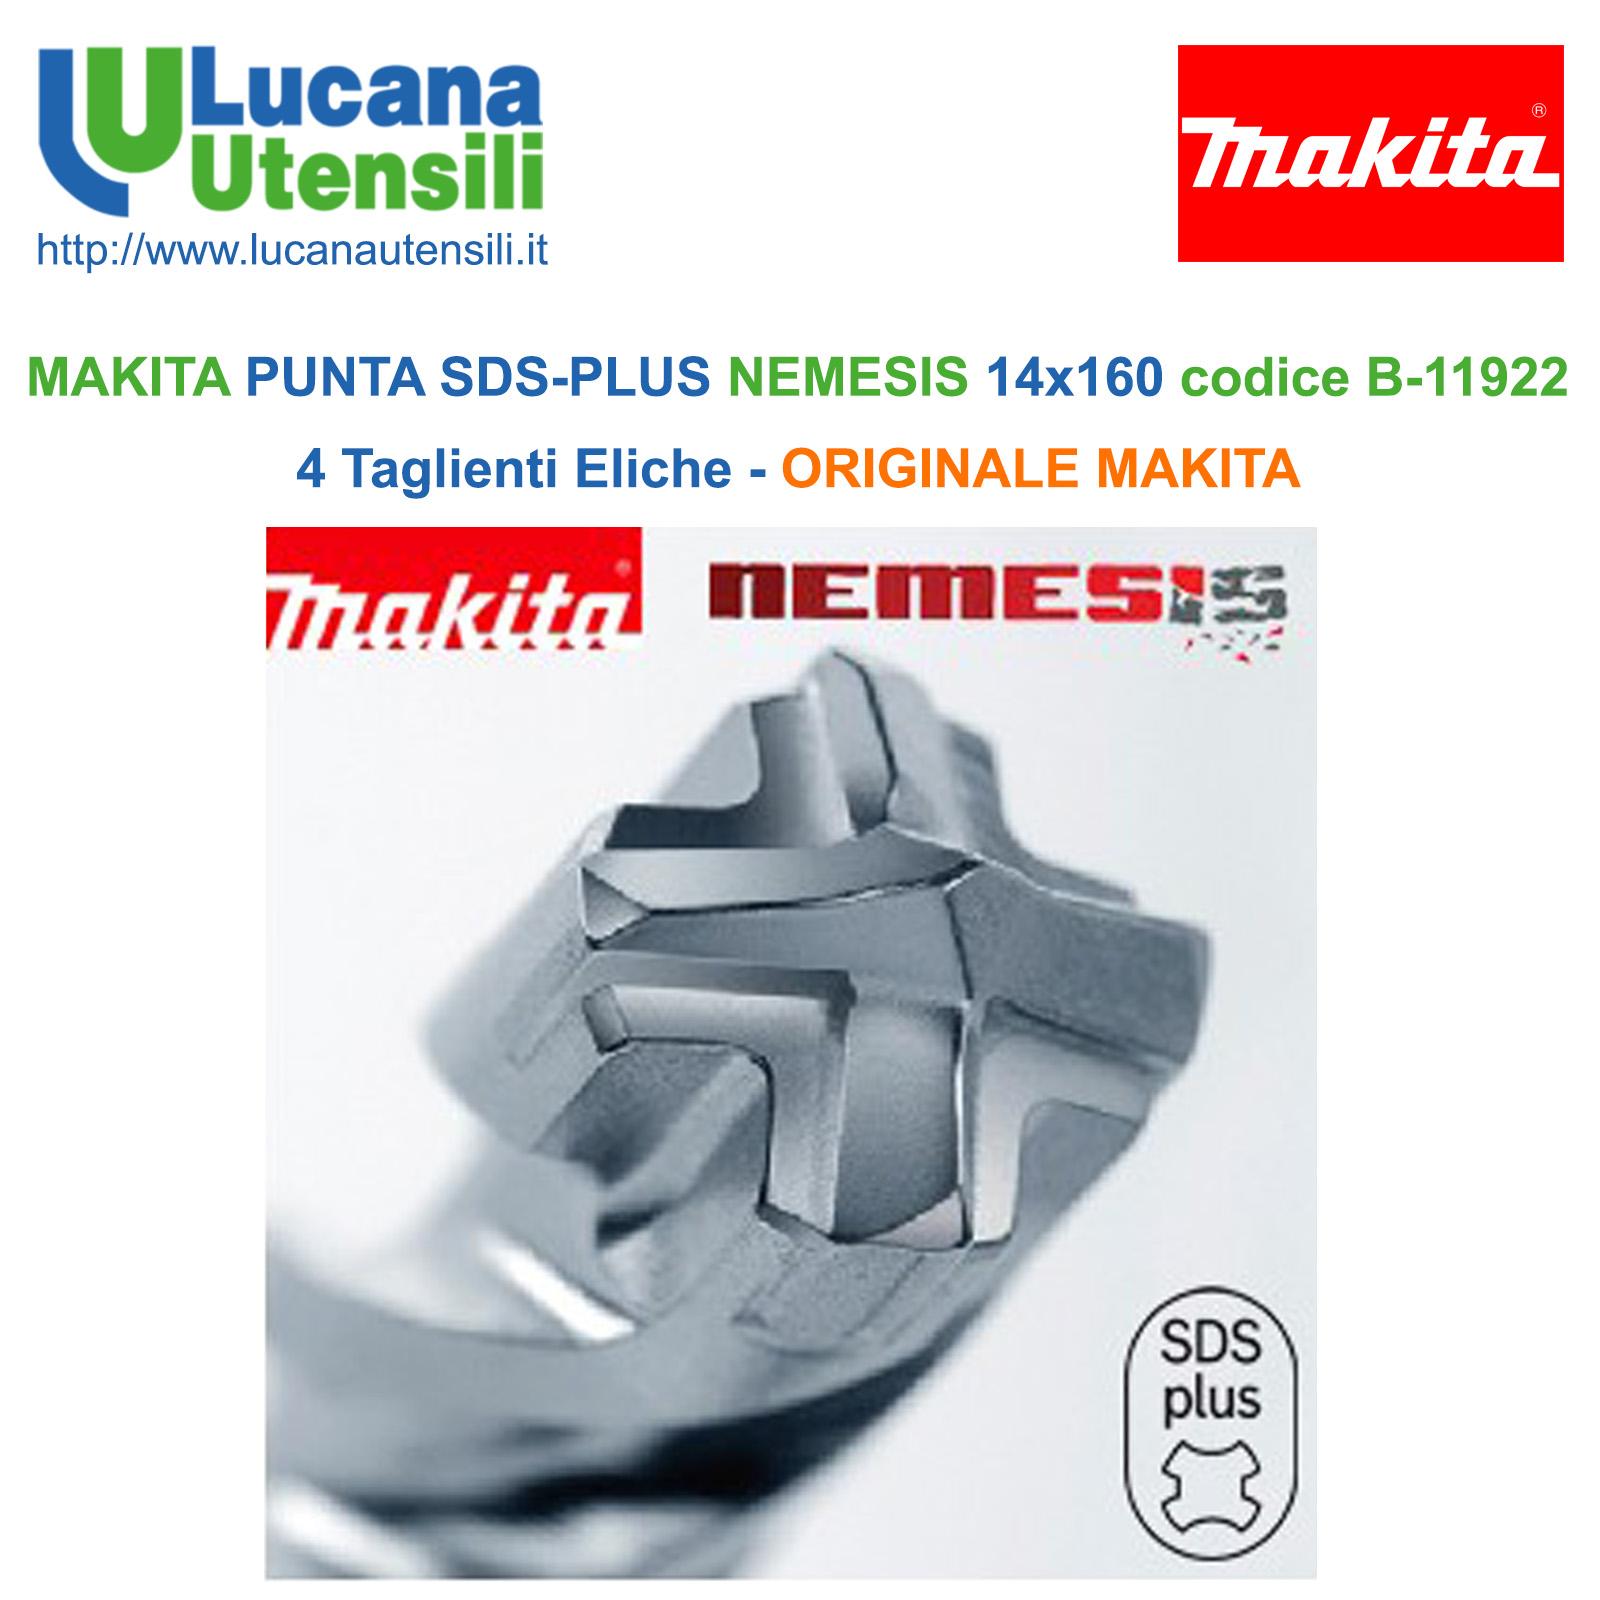 Punta SDS Makita B-58322 12 mm x 160 mm